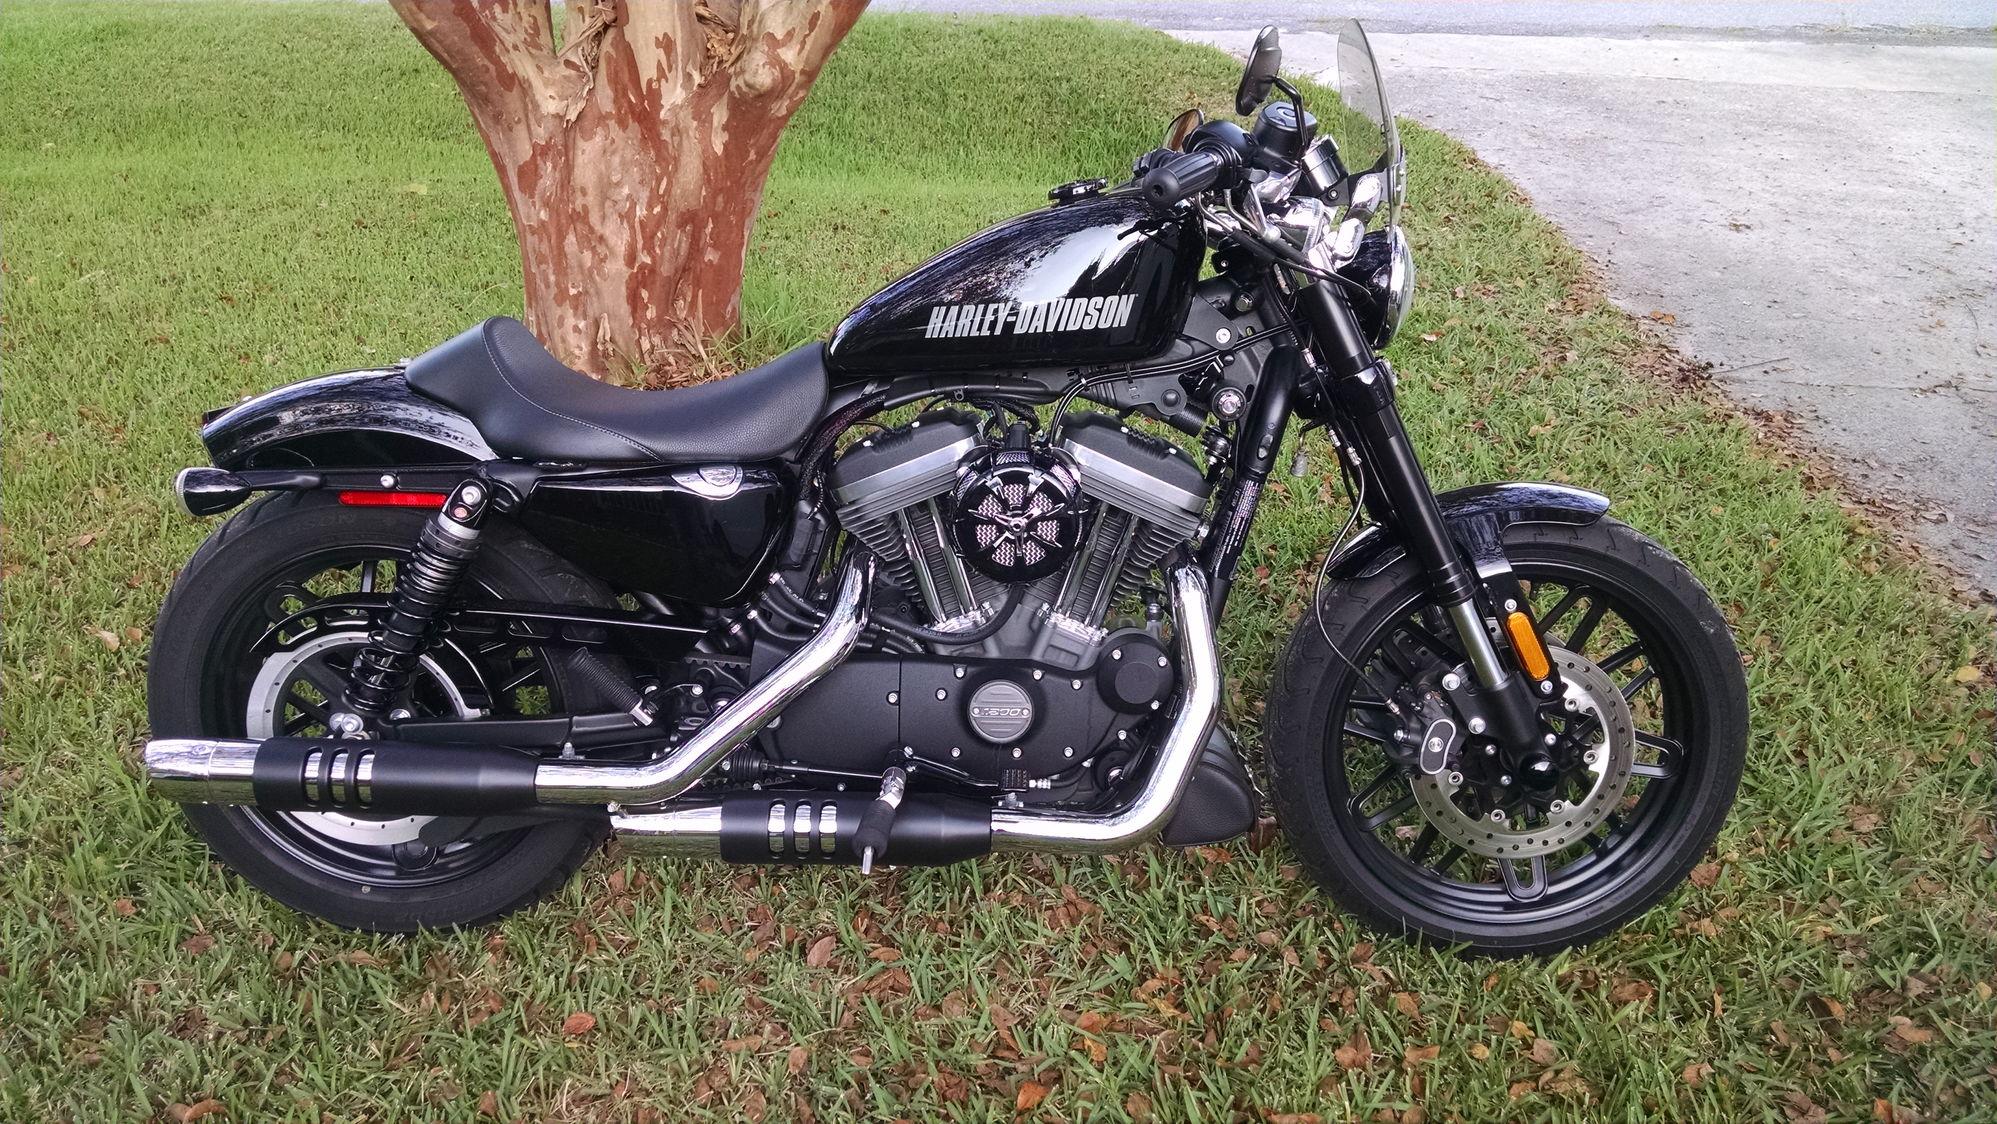 Wiring Diagram 96 Hd Fatboy Schematics Data Diagrams 2003 Harley Davidson Road King Softail Deuce Low Rider Sportster